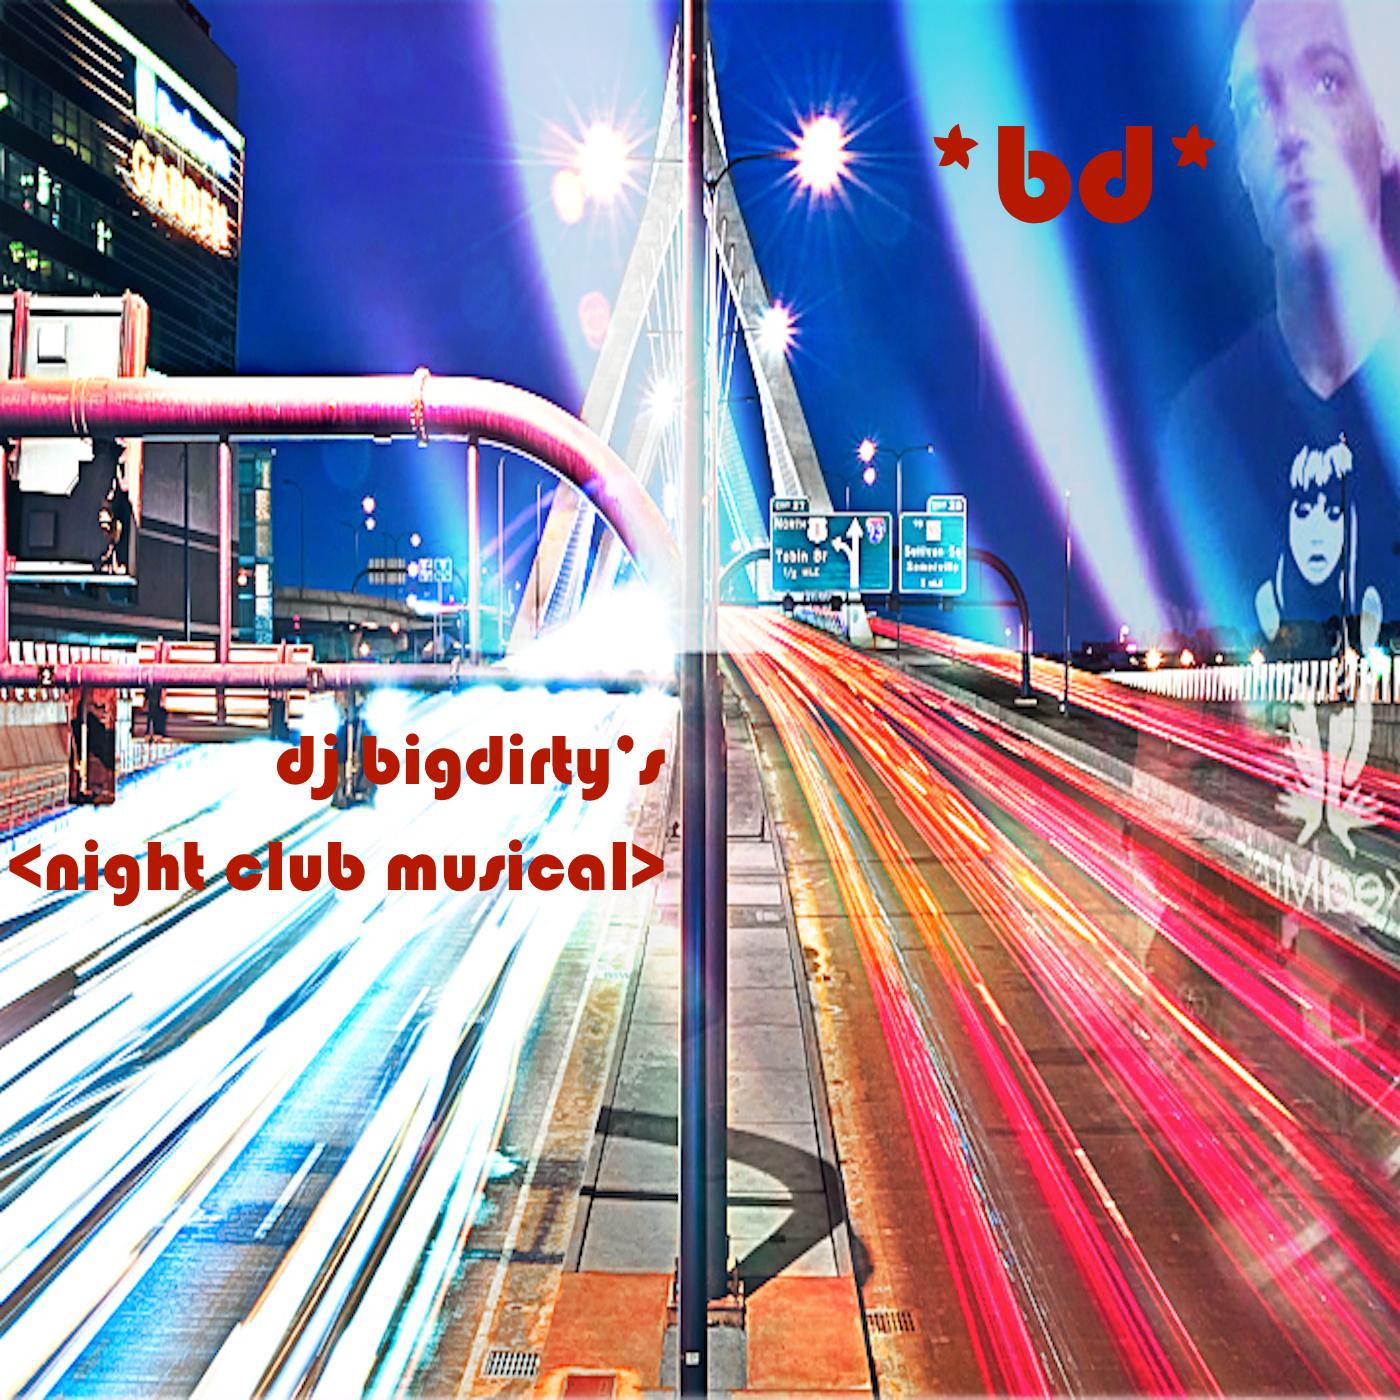 dj bigdirty's: night club musical show art